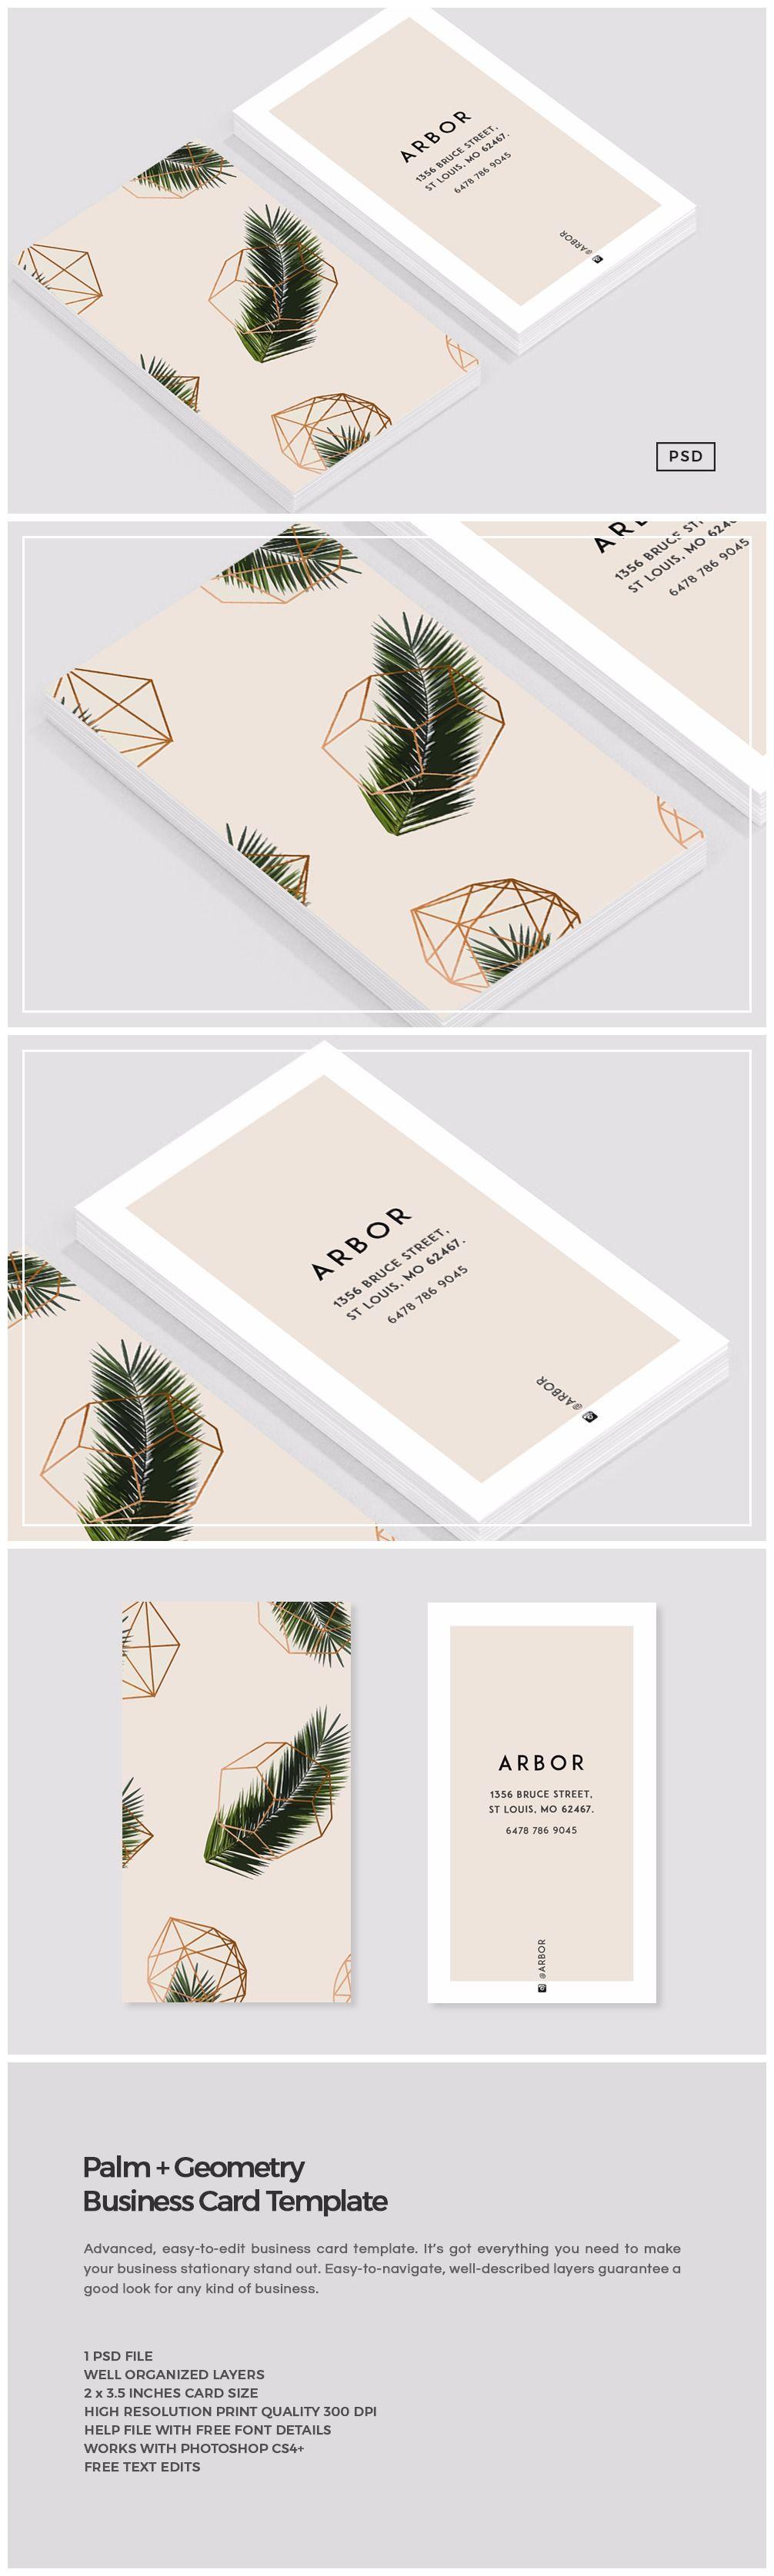 Palm Geometry Business Card Card Design Business Design Business Card Design